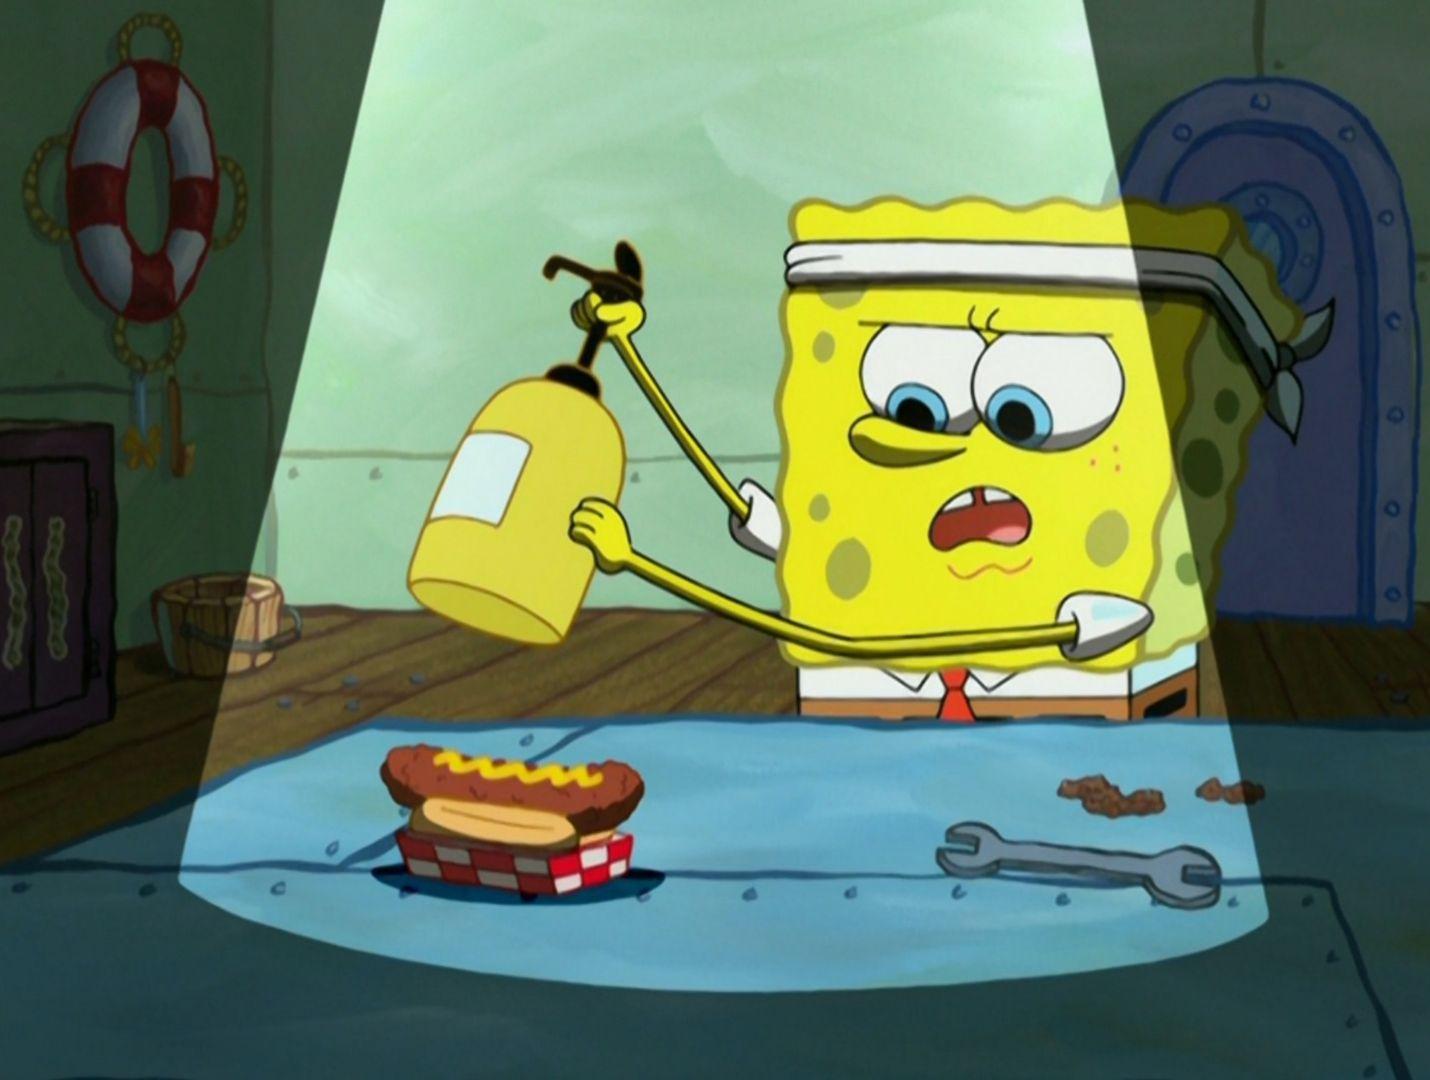 Adds a mustard